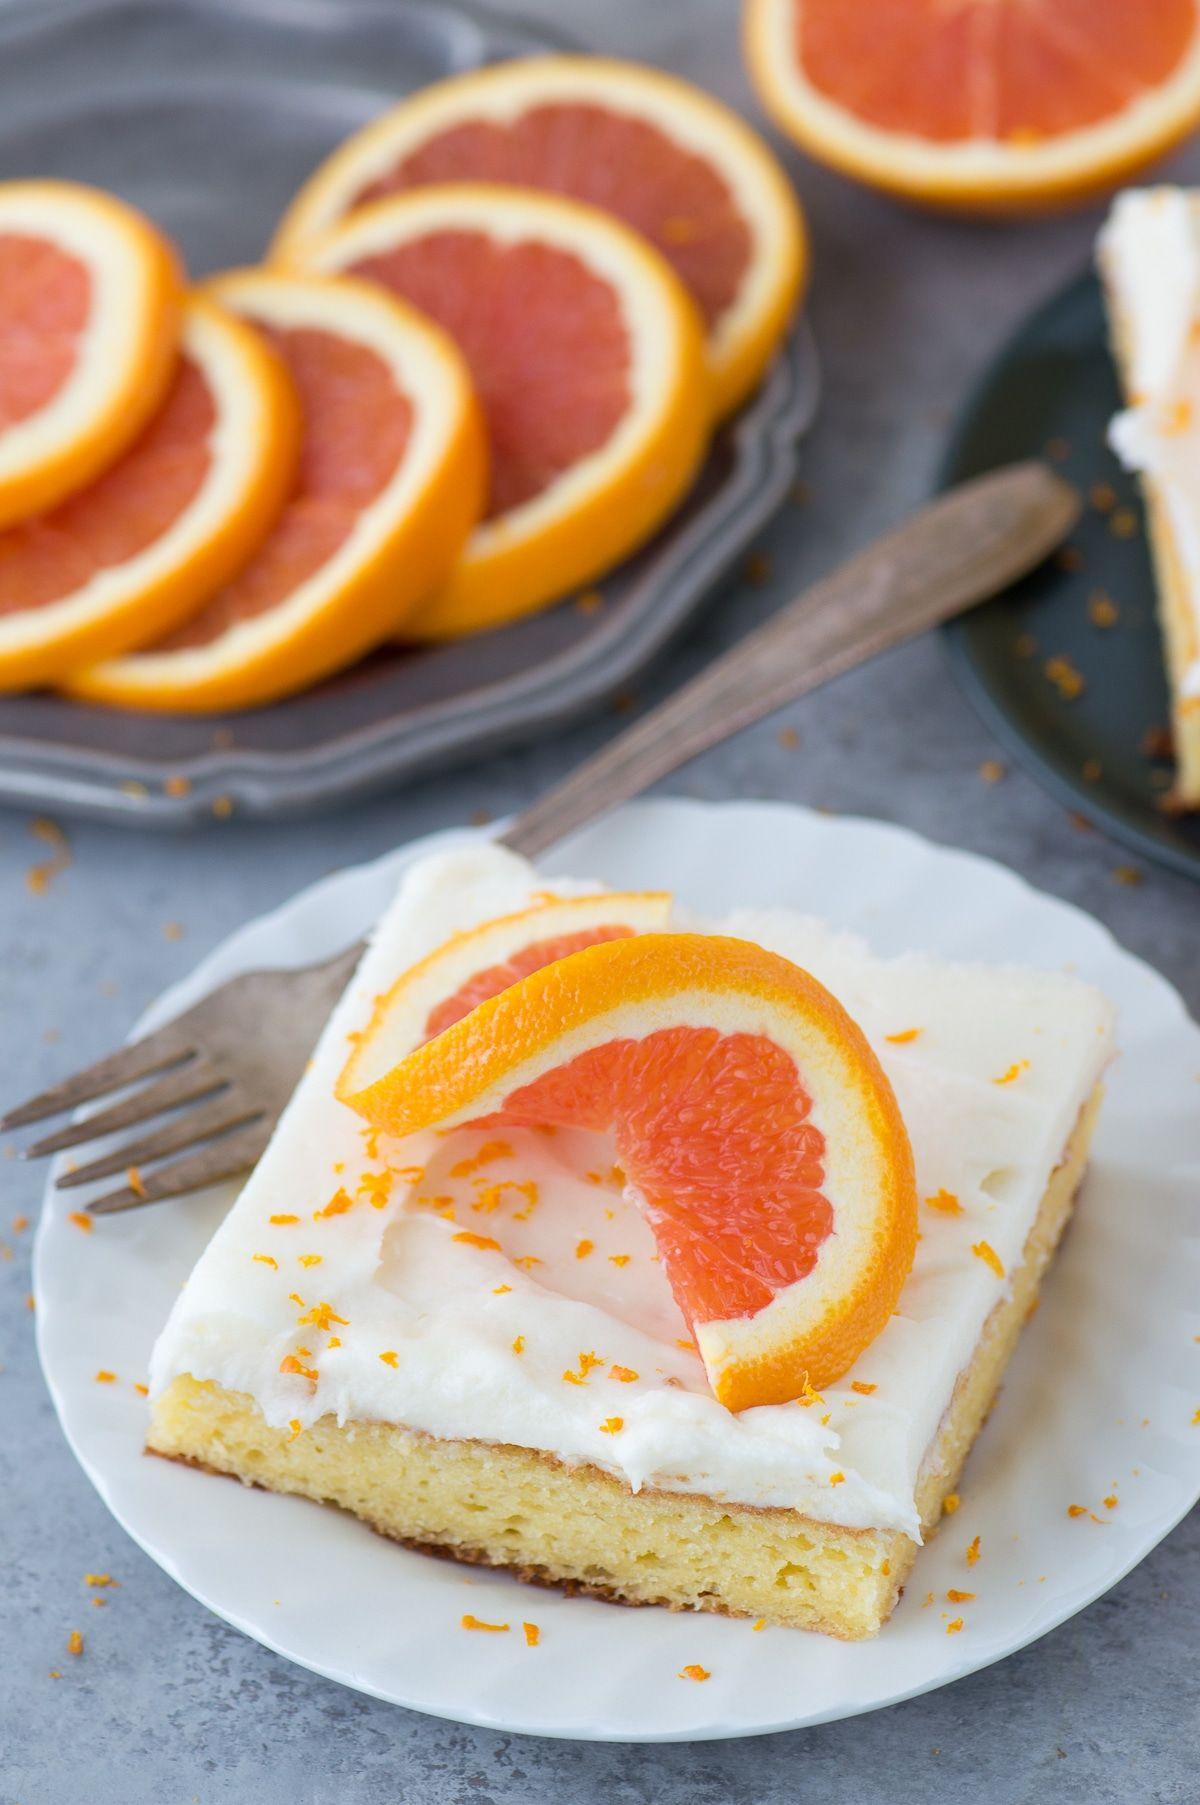 A quick dessert recipe for florida orange cake a doctored